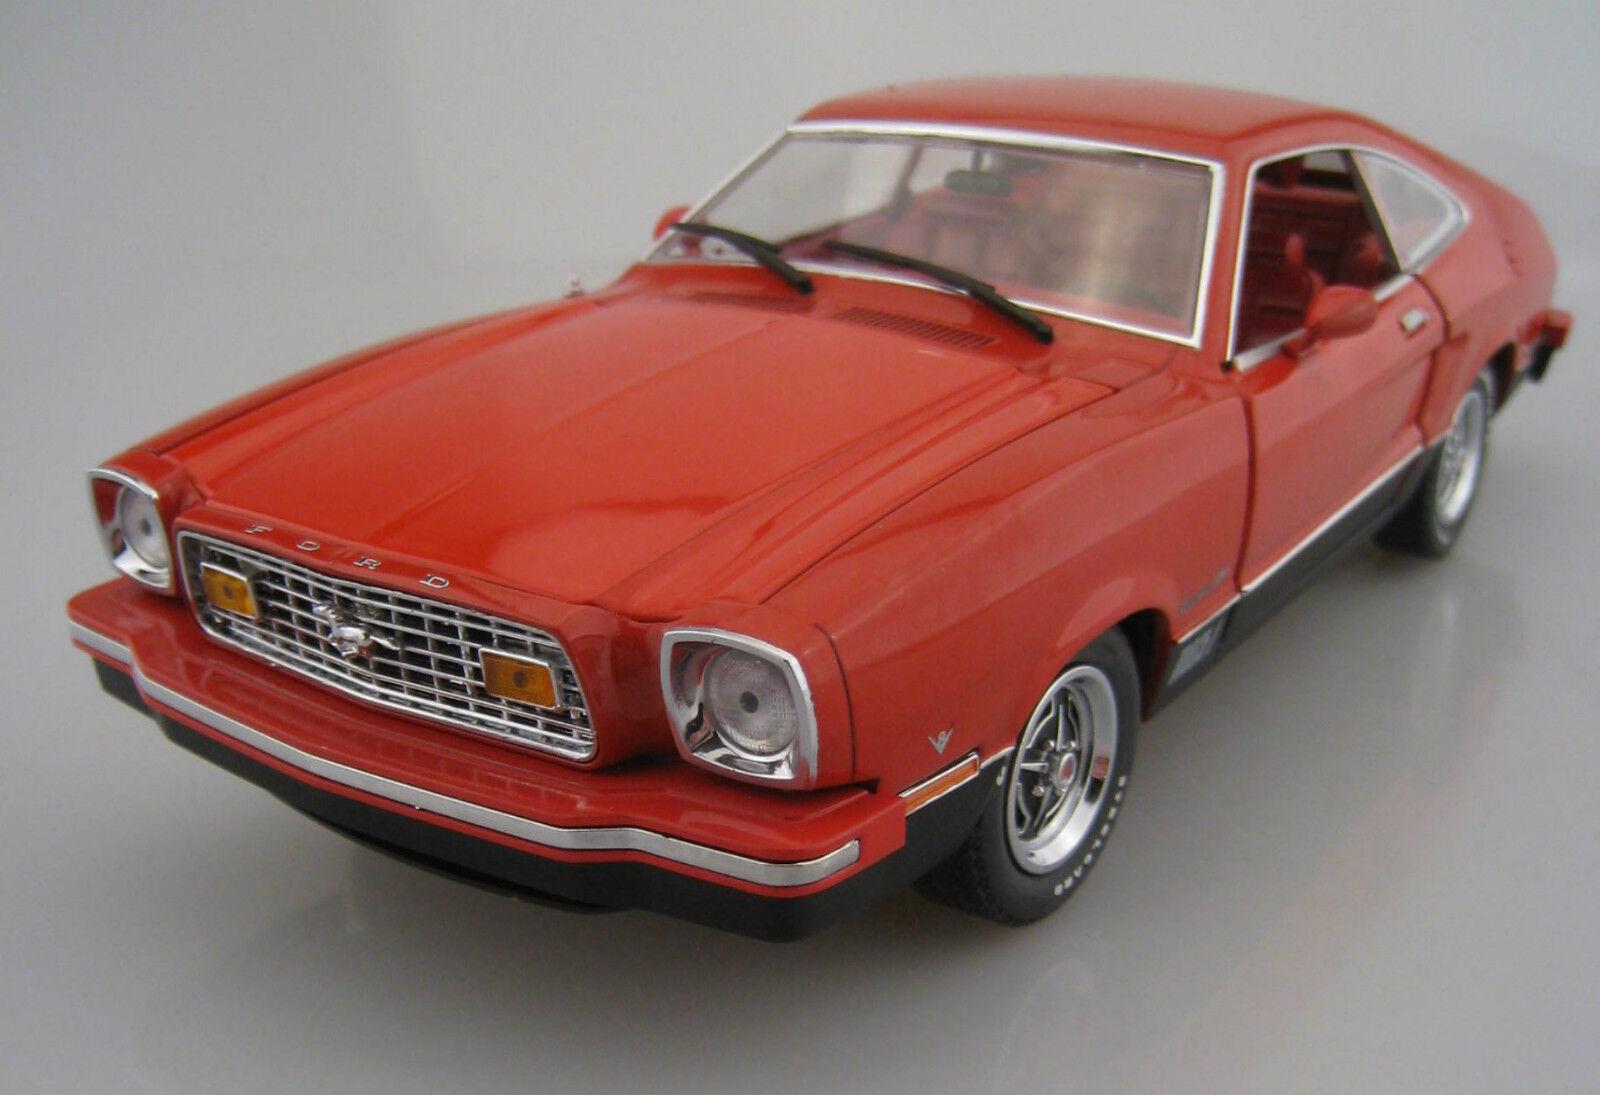 Ford Mustang II Mach 1 vertlight Limitée 1 18 neuf dans sa boîte